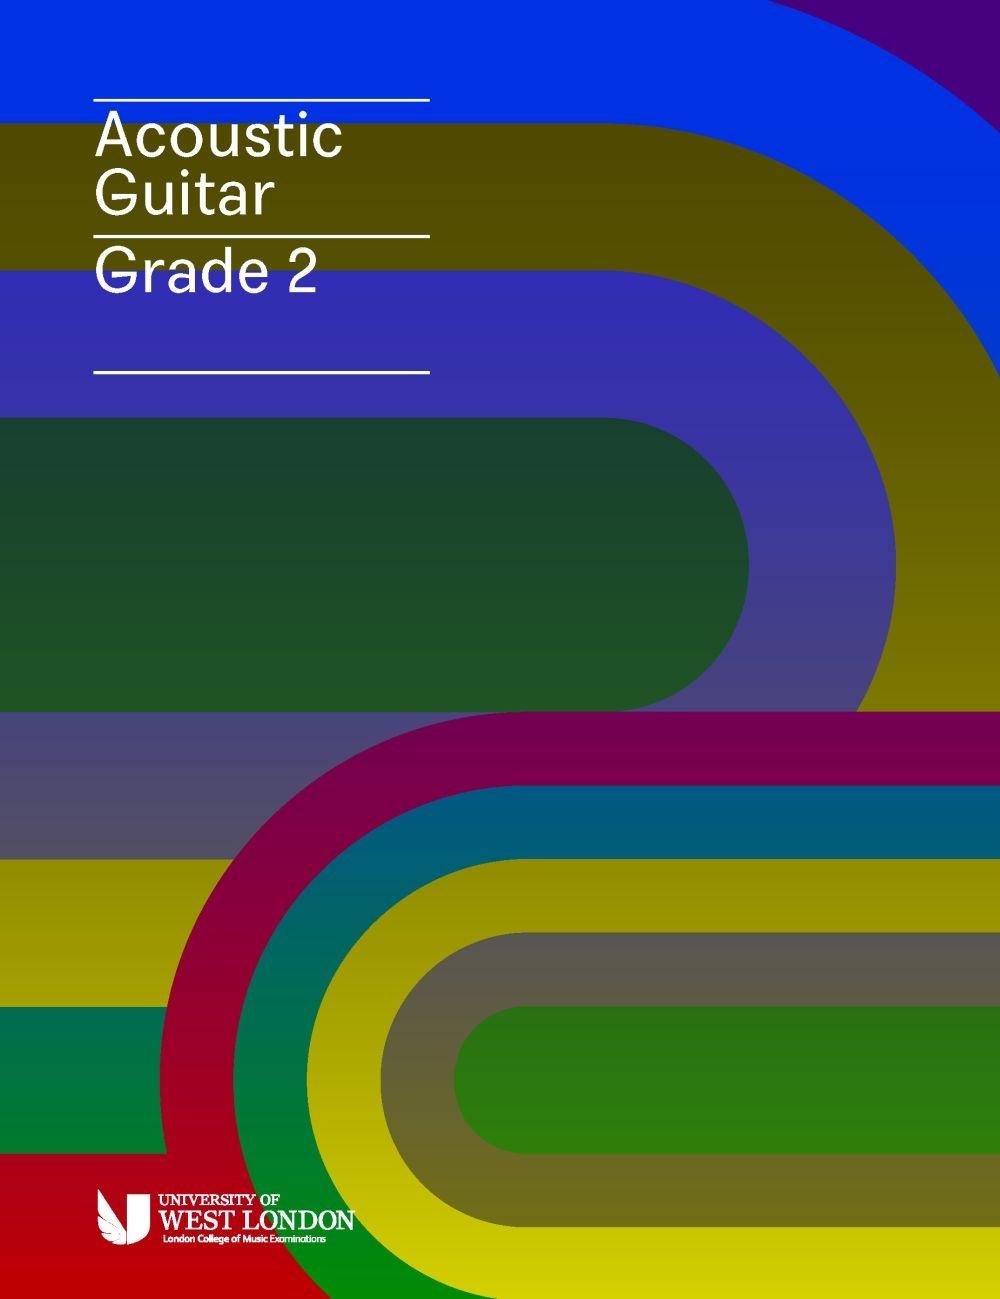 LCM Acoustic Guitar Handbook Grade 2 2020: Acoustic Guitar: Instrumental Tutor